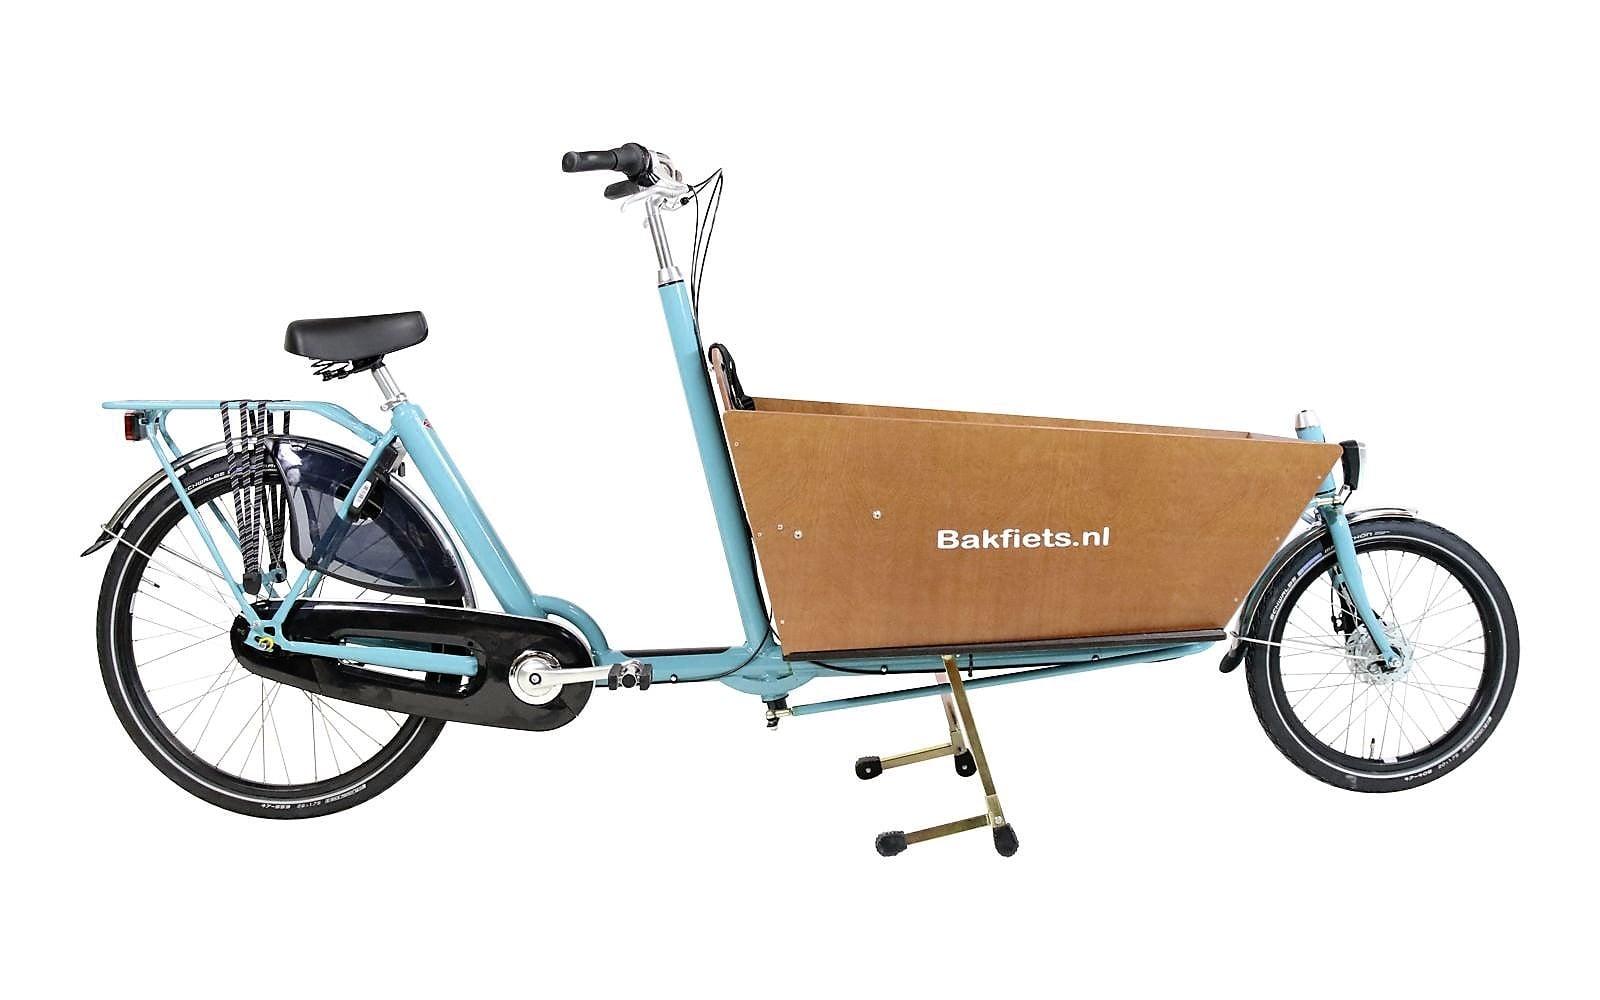 Bakfiets Classic Long London Green Cycleslondon Green Cycles